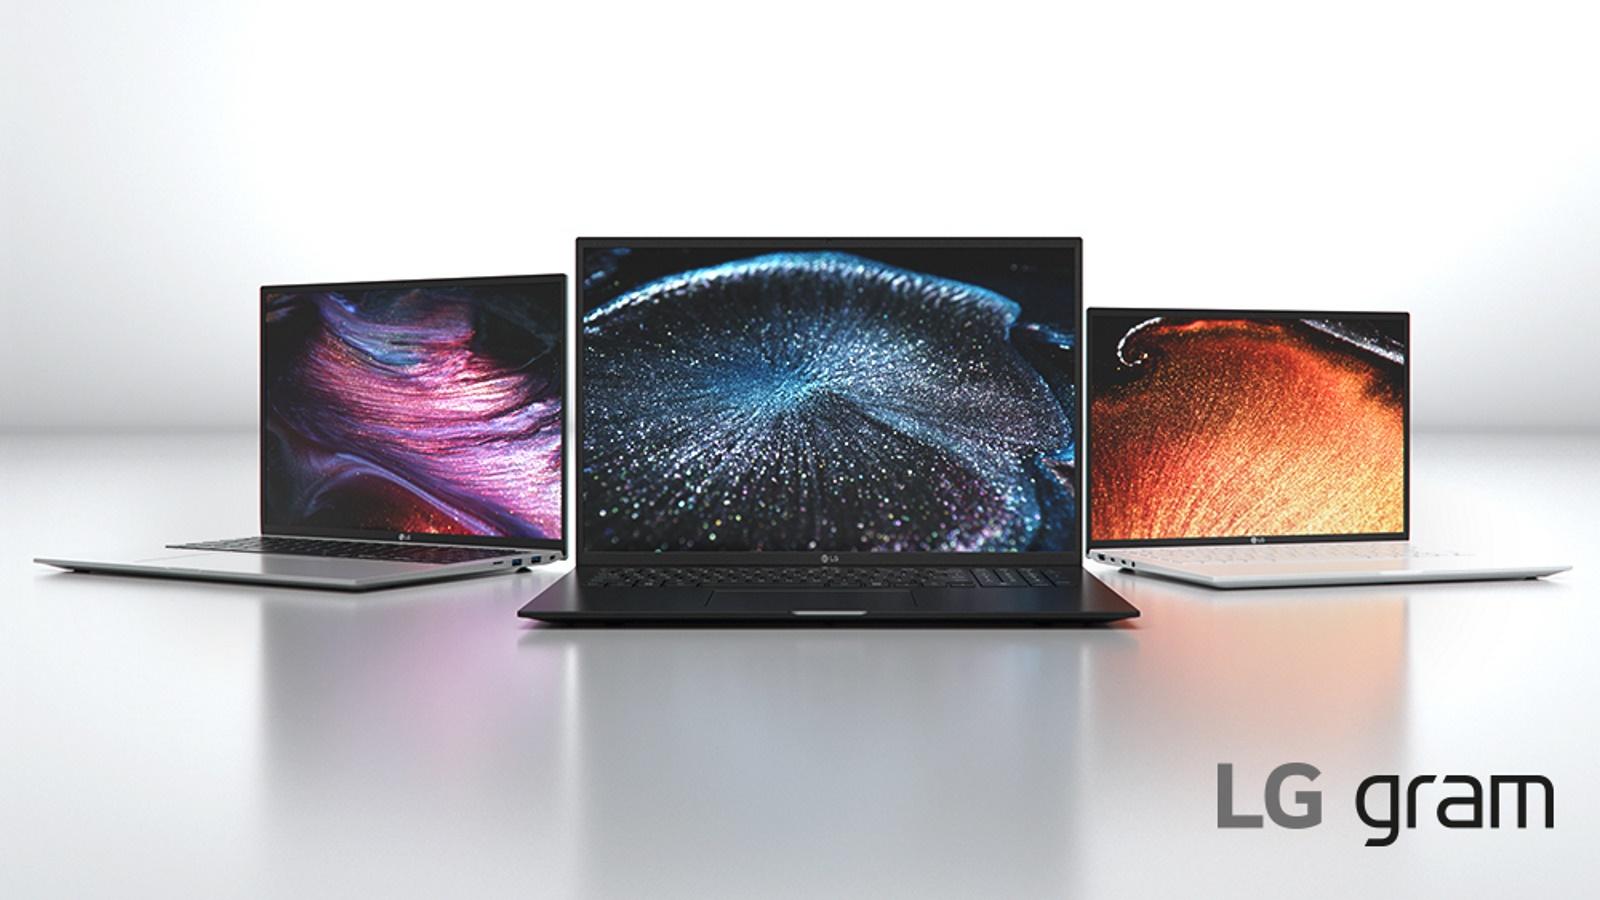 LG Gram at CES 2021